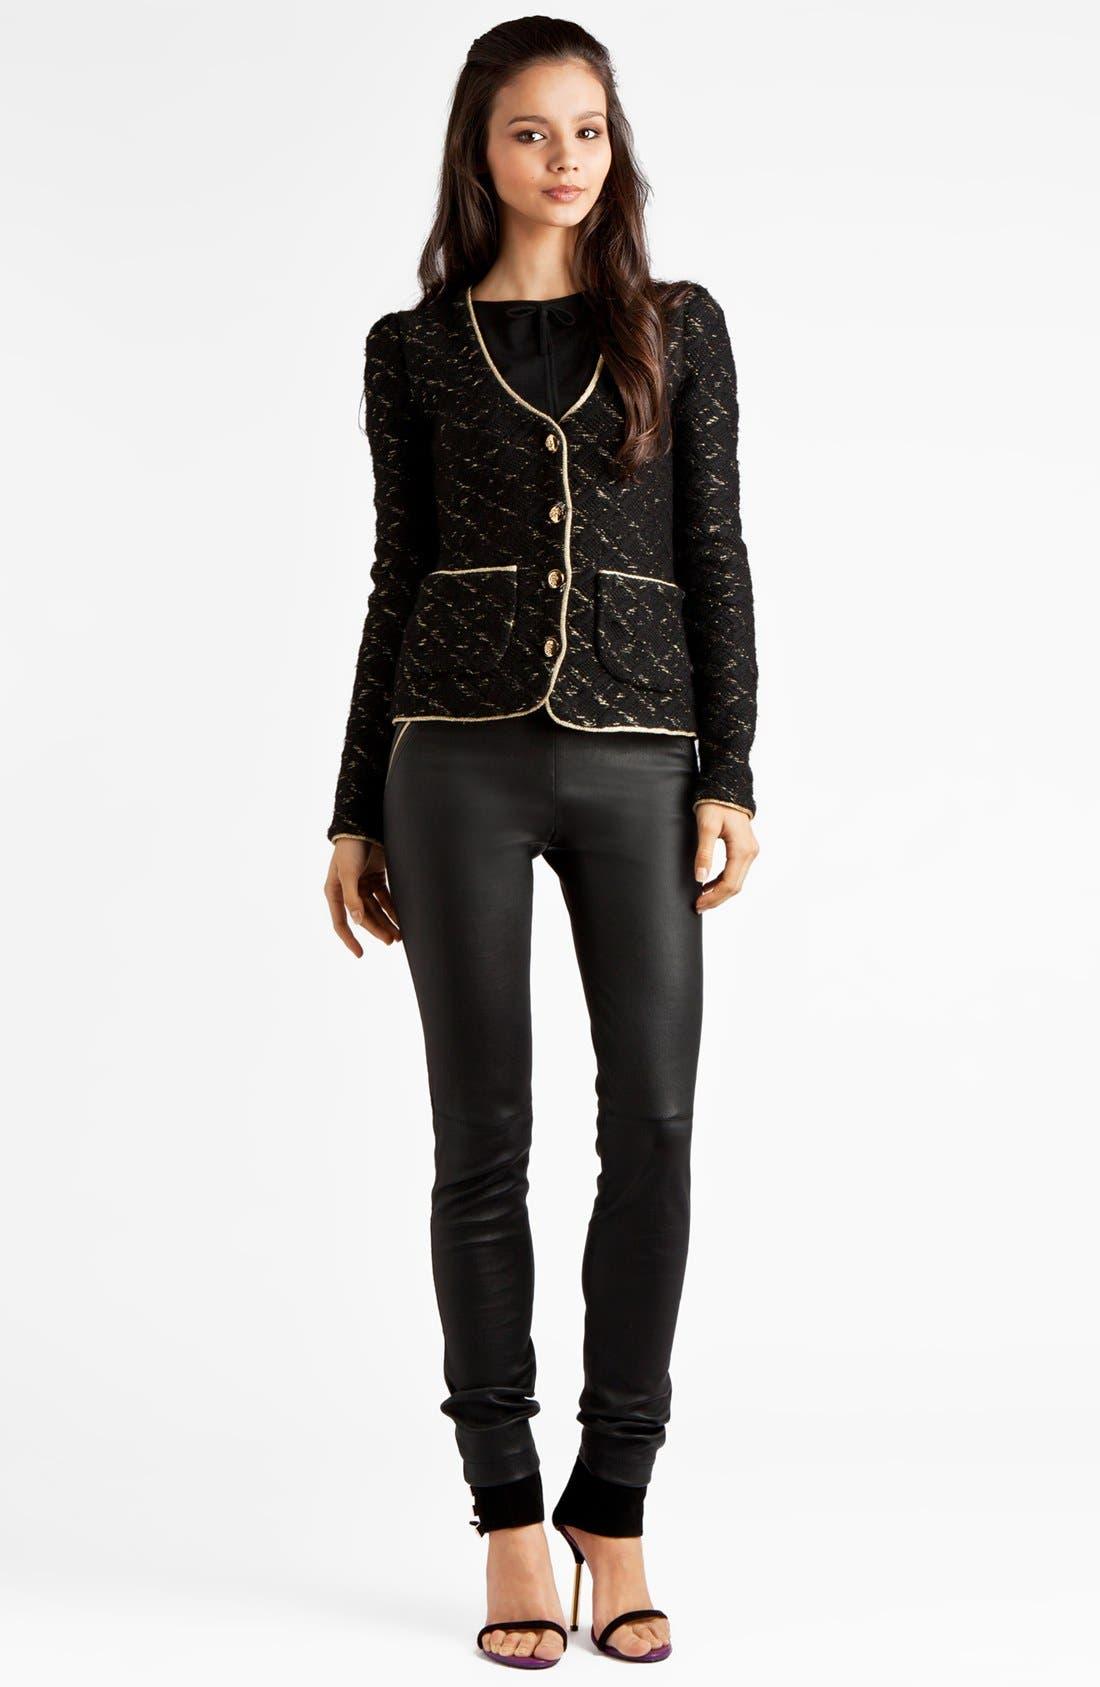 Main Image - Emilio Pucci Metallic Jacket